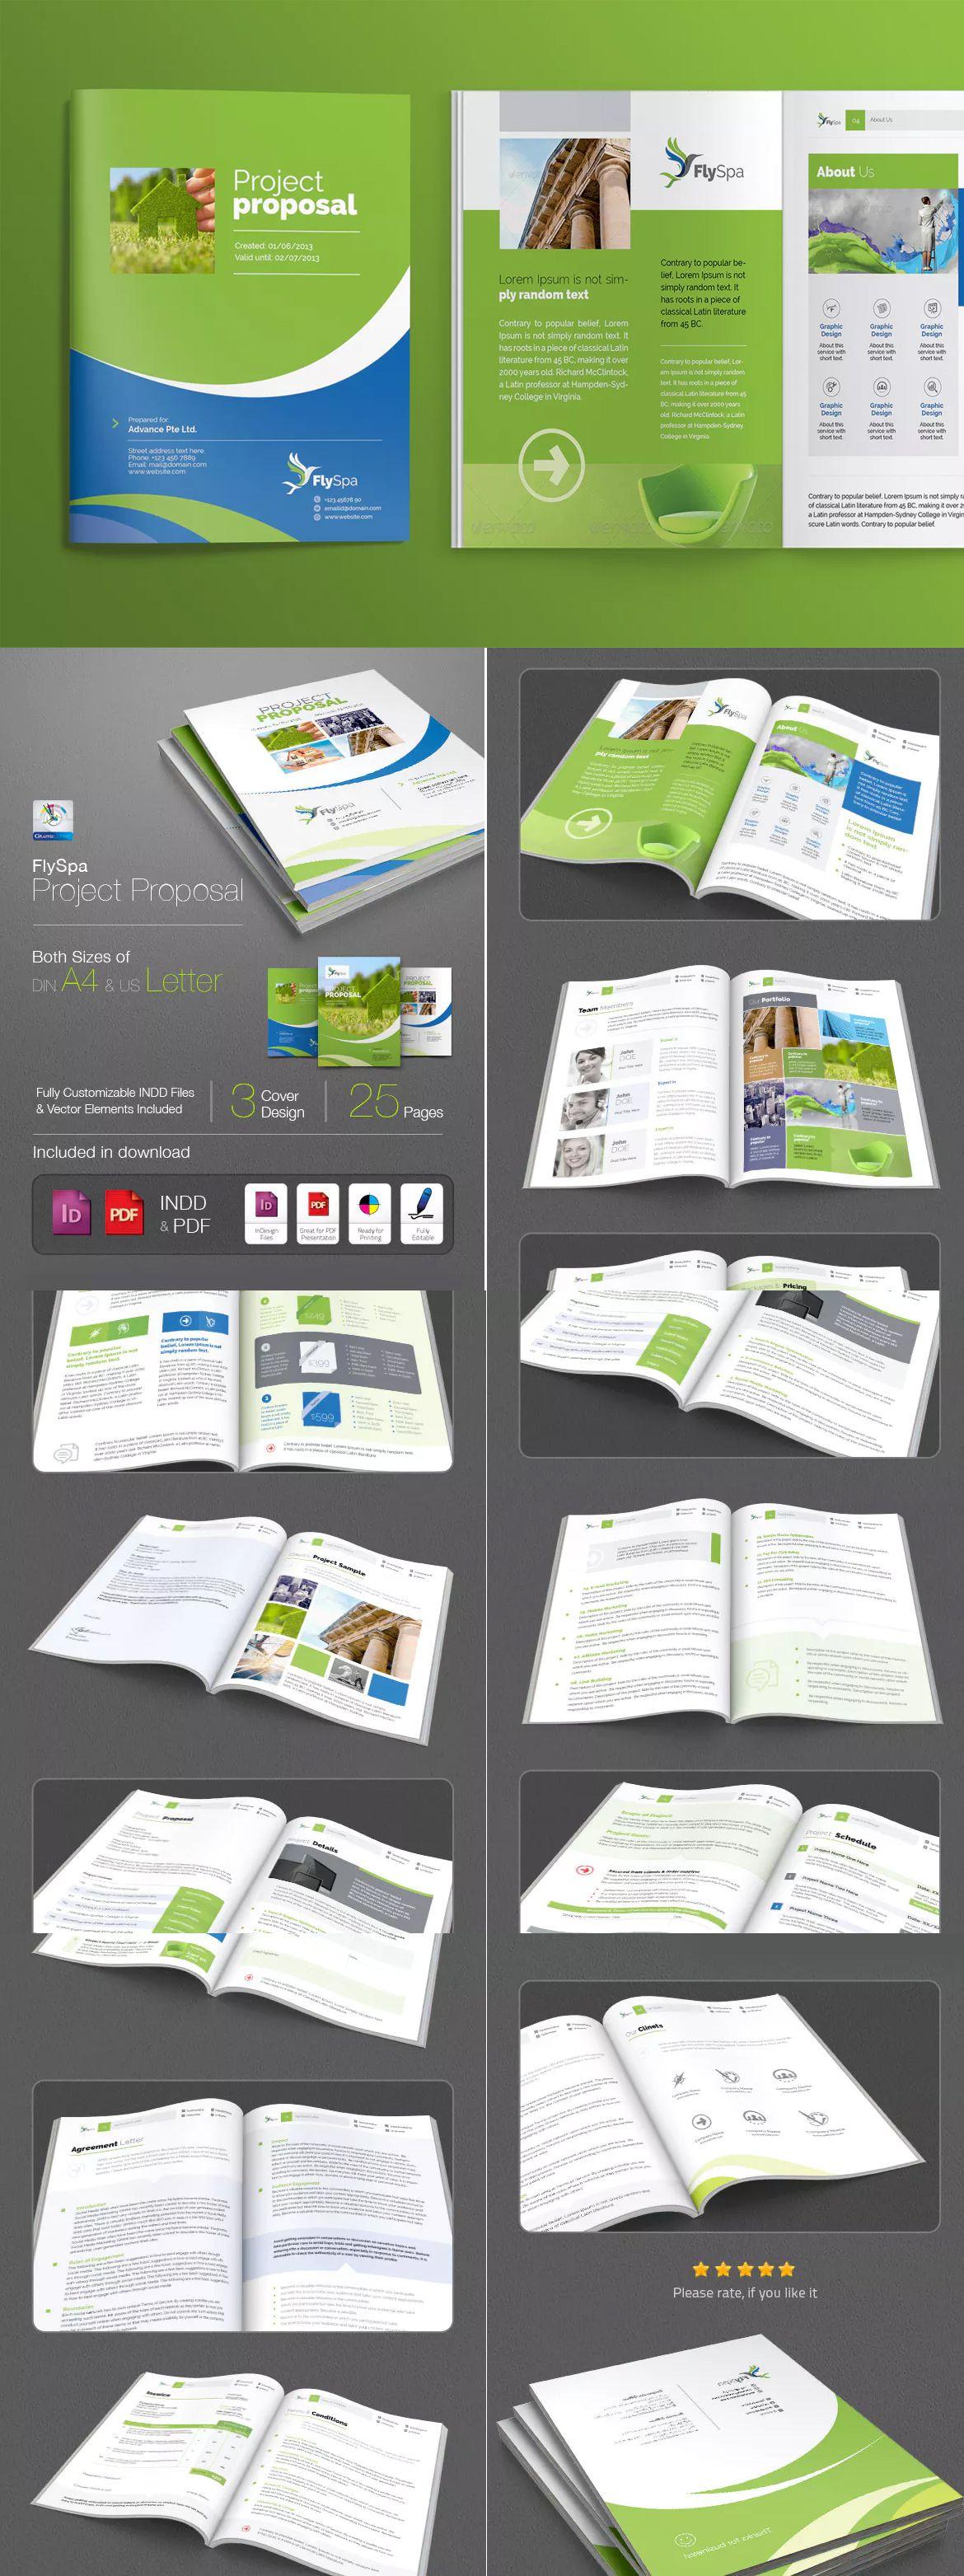 FlySpa | Project Proposal Brochure Template InDesign INDD | Proposal ...